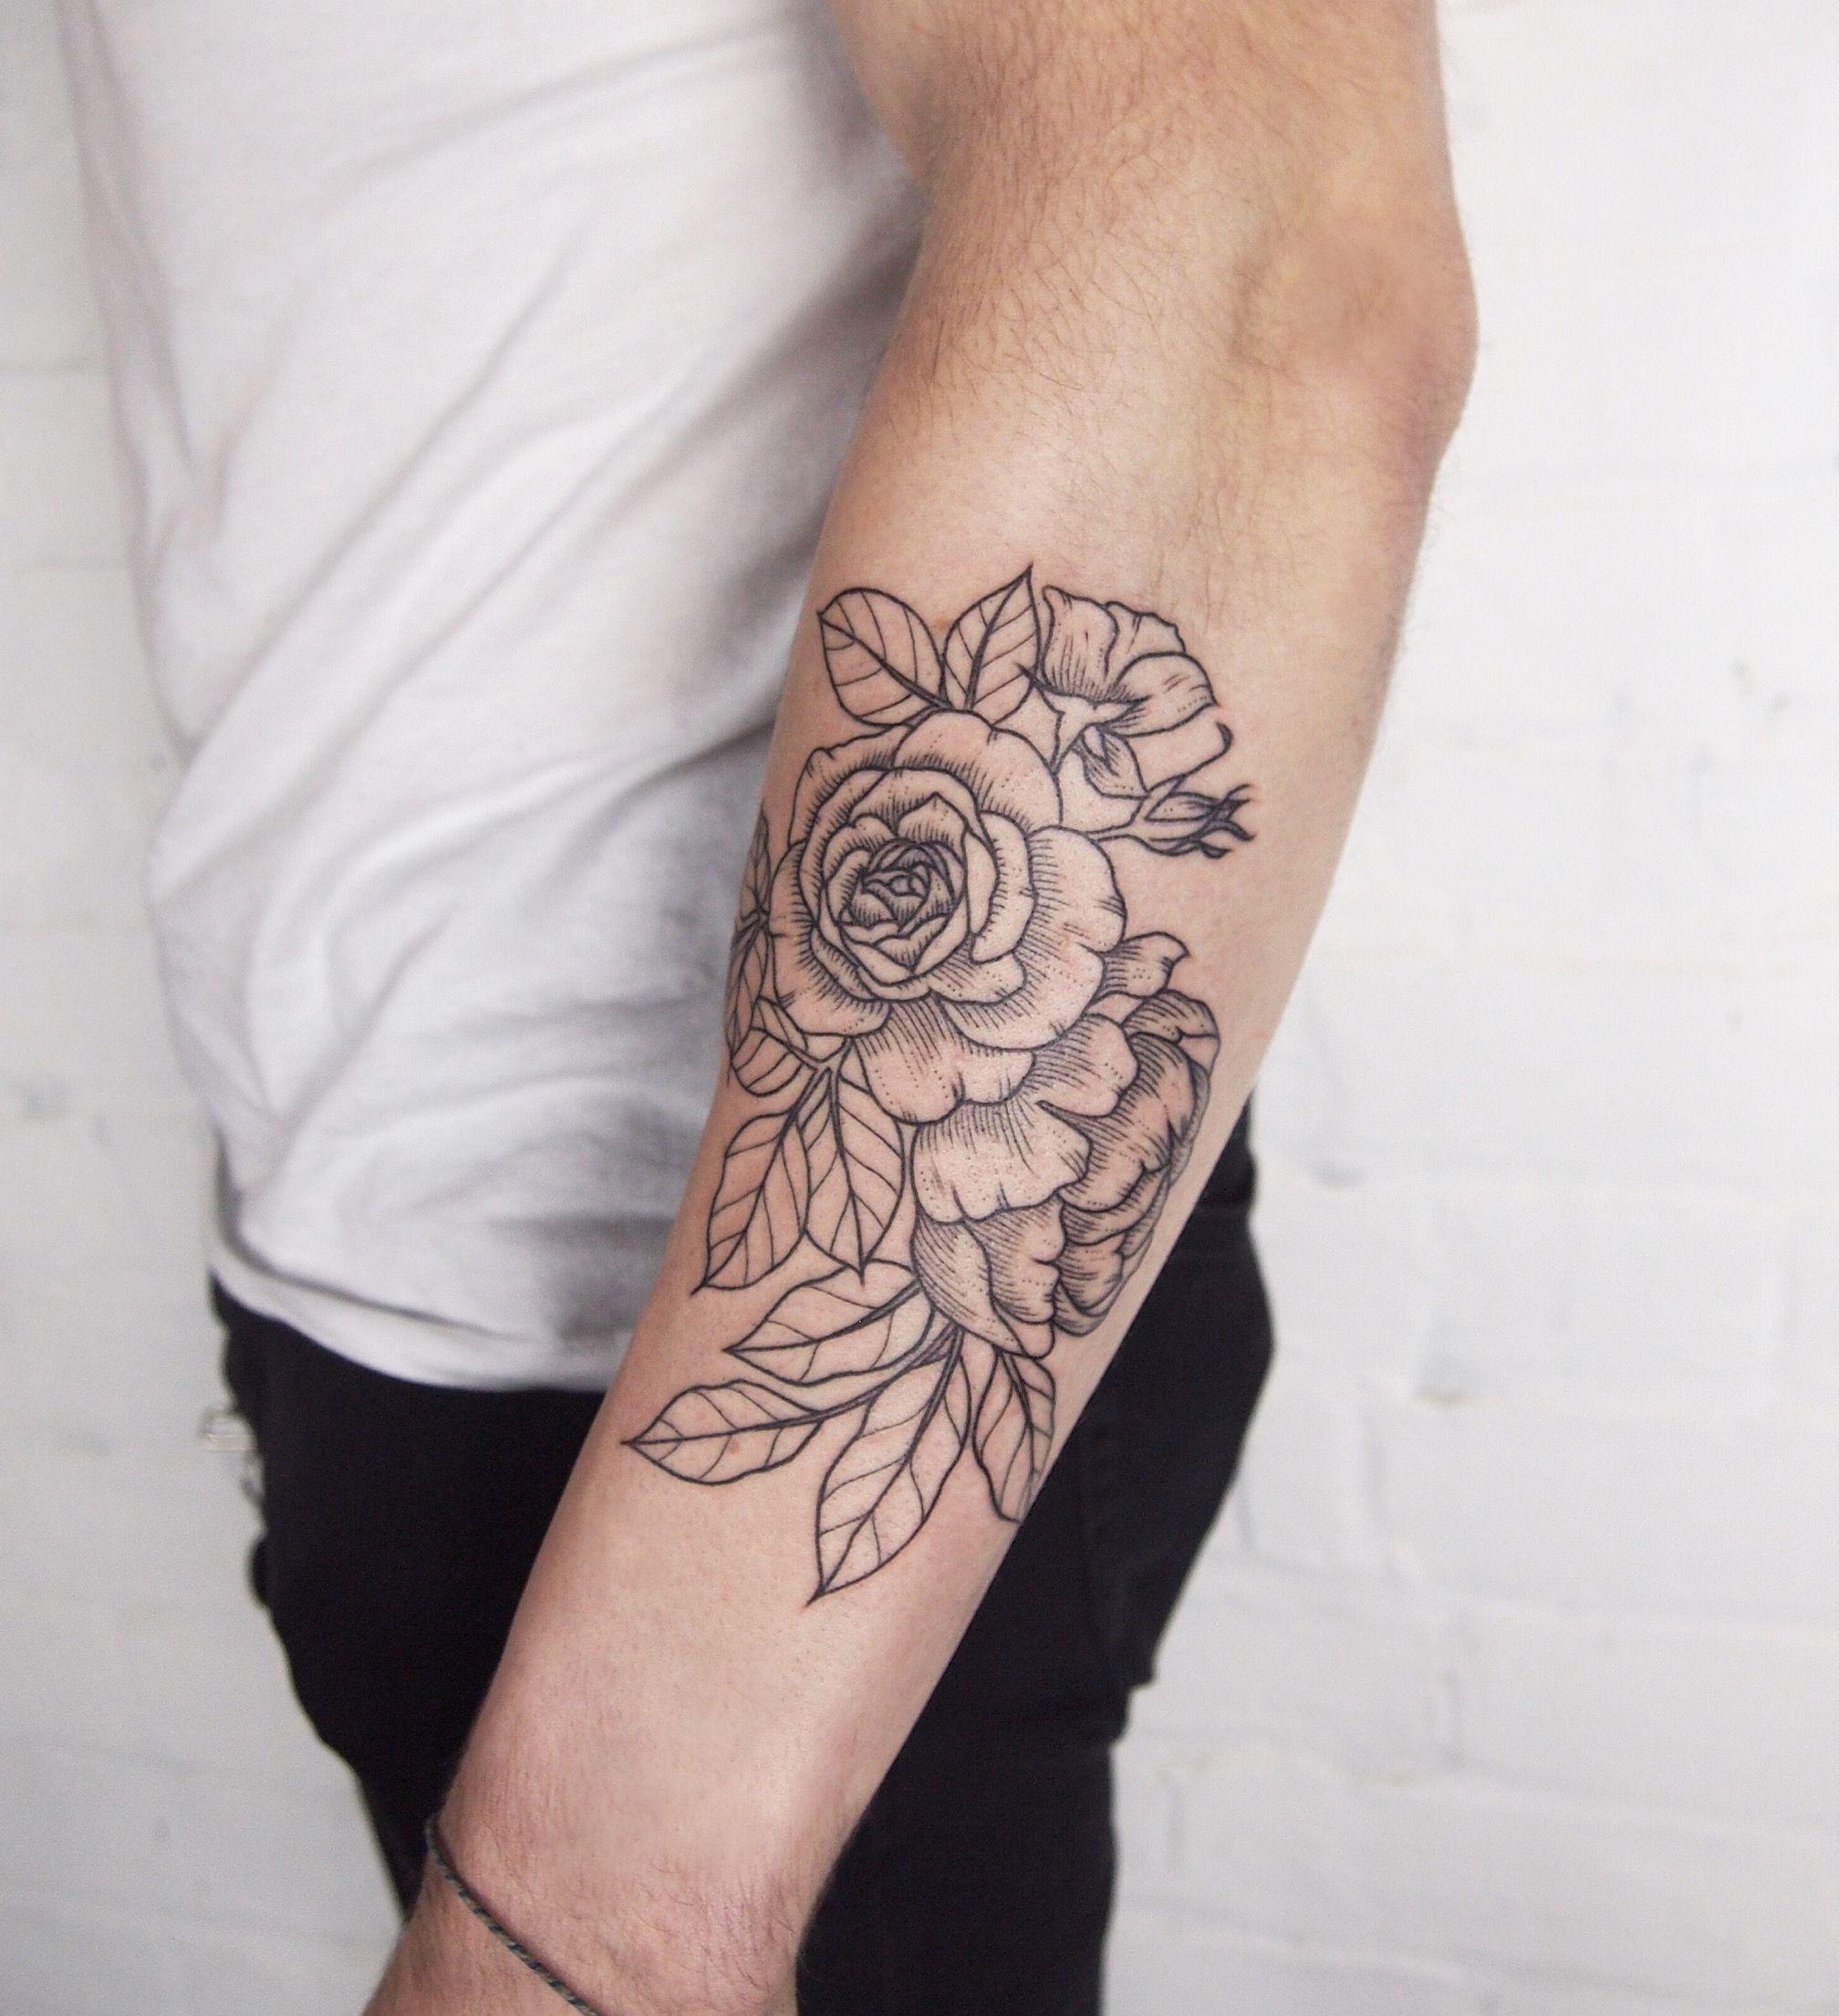 Rose And Peony Linework Tattoo People Toronto Jess Chen Line Work Tattoo Tattoos Tattoo People